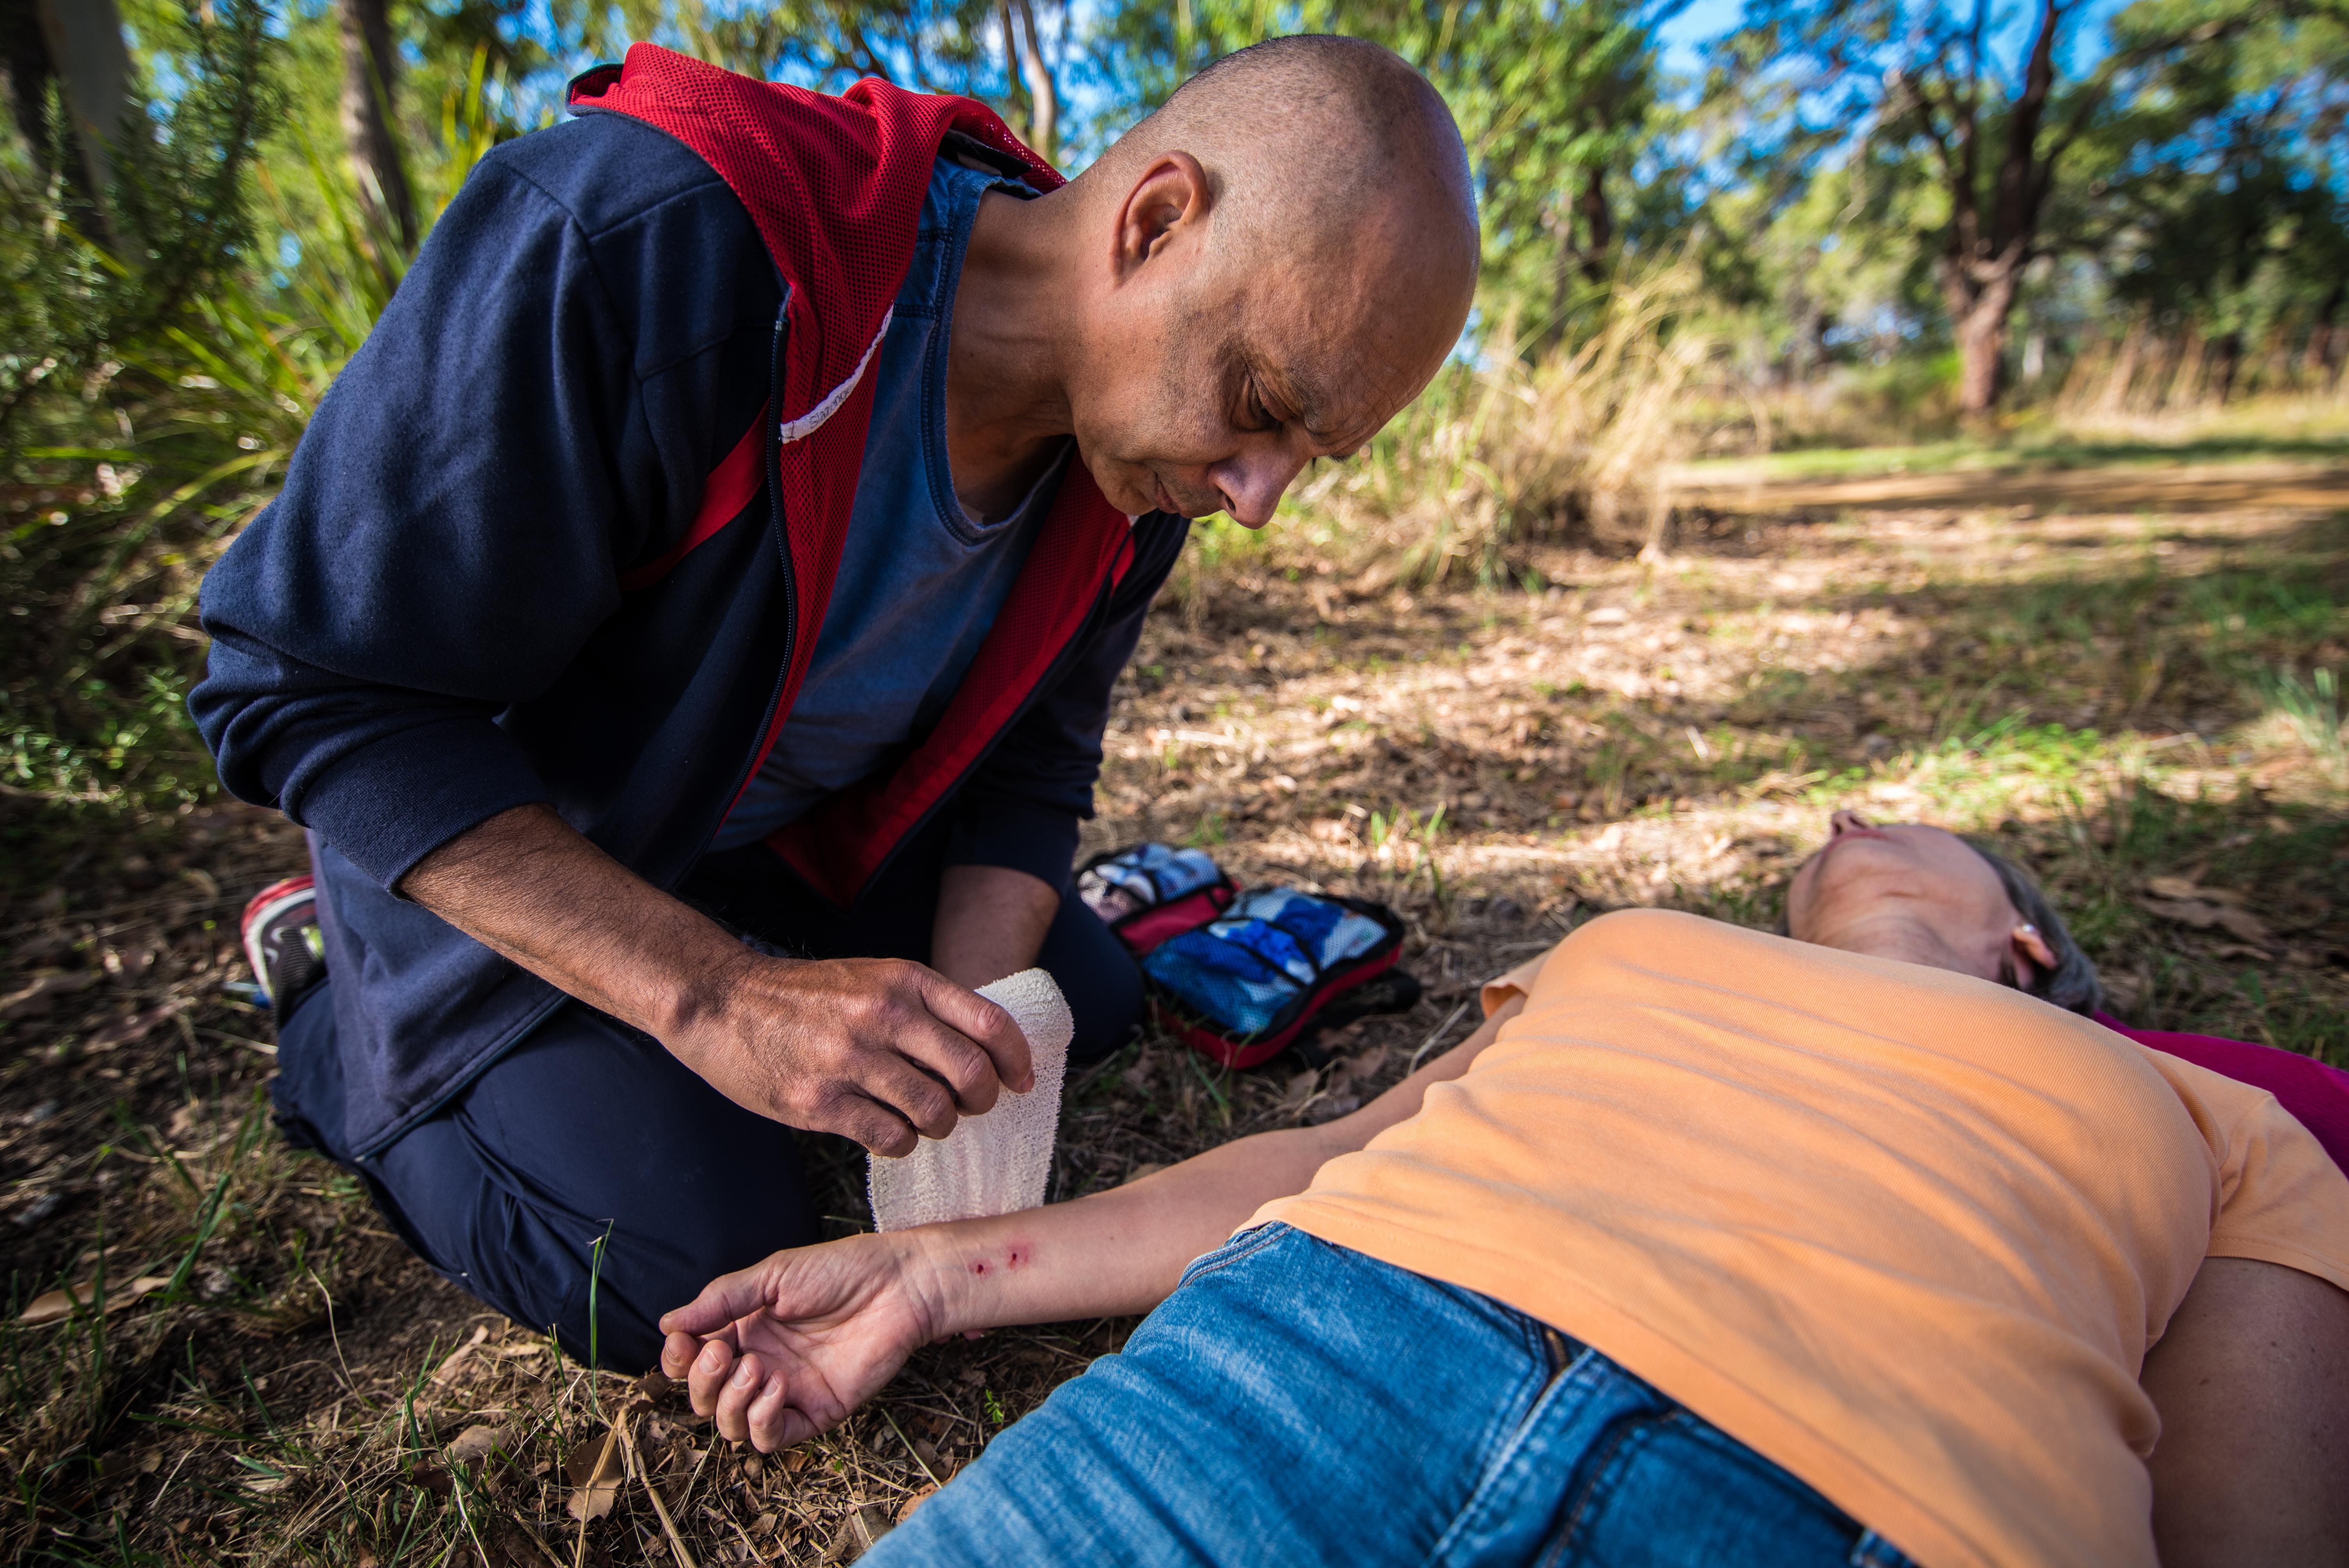 Snake Bite First Aid Training Scenarios 2019 (18)